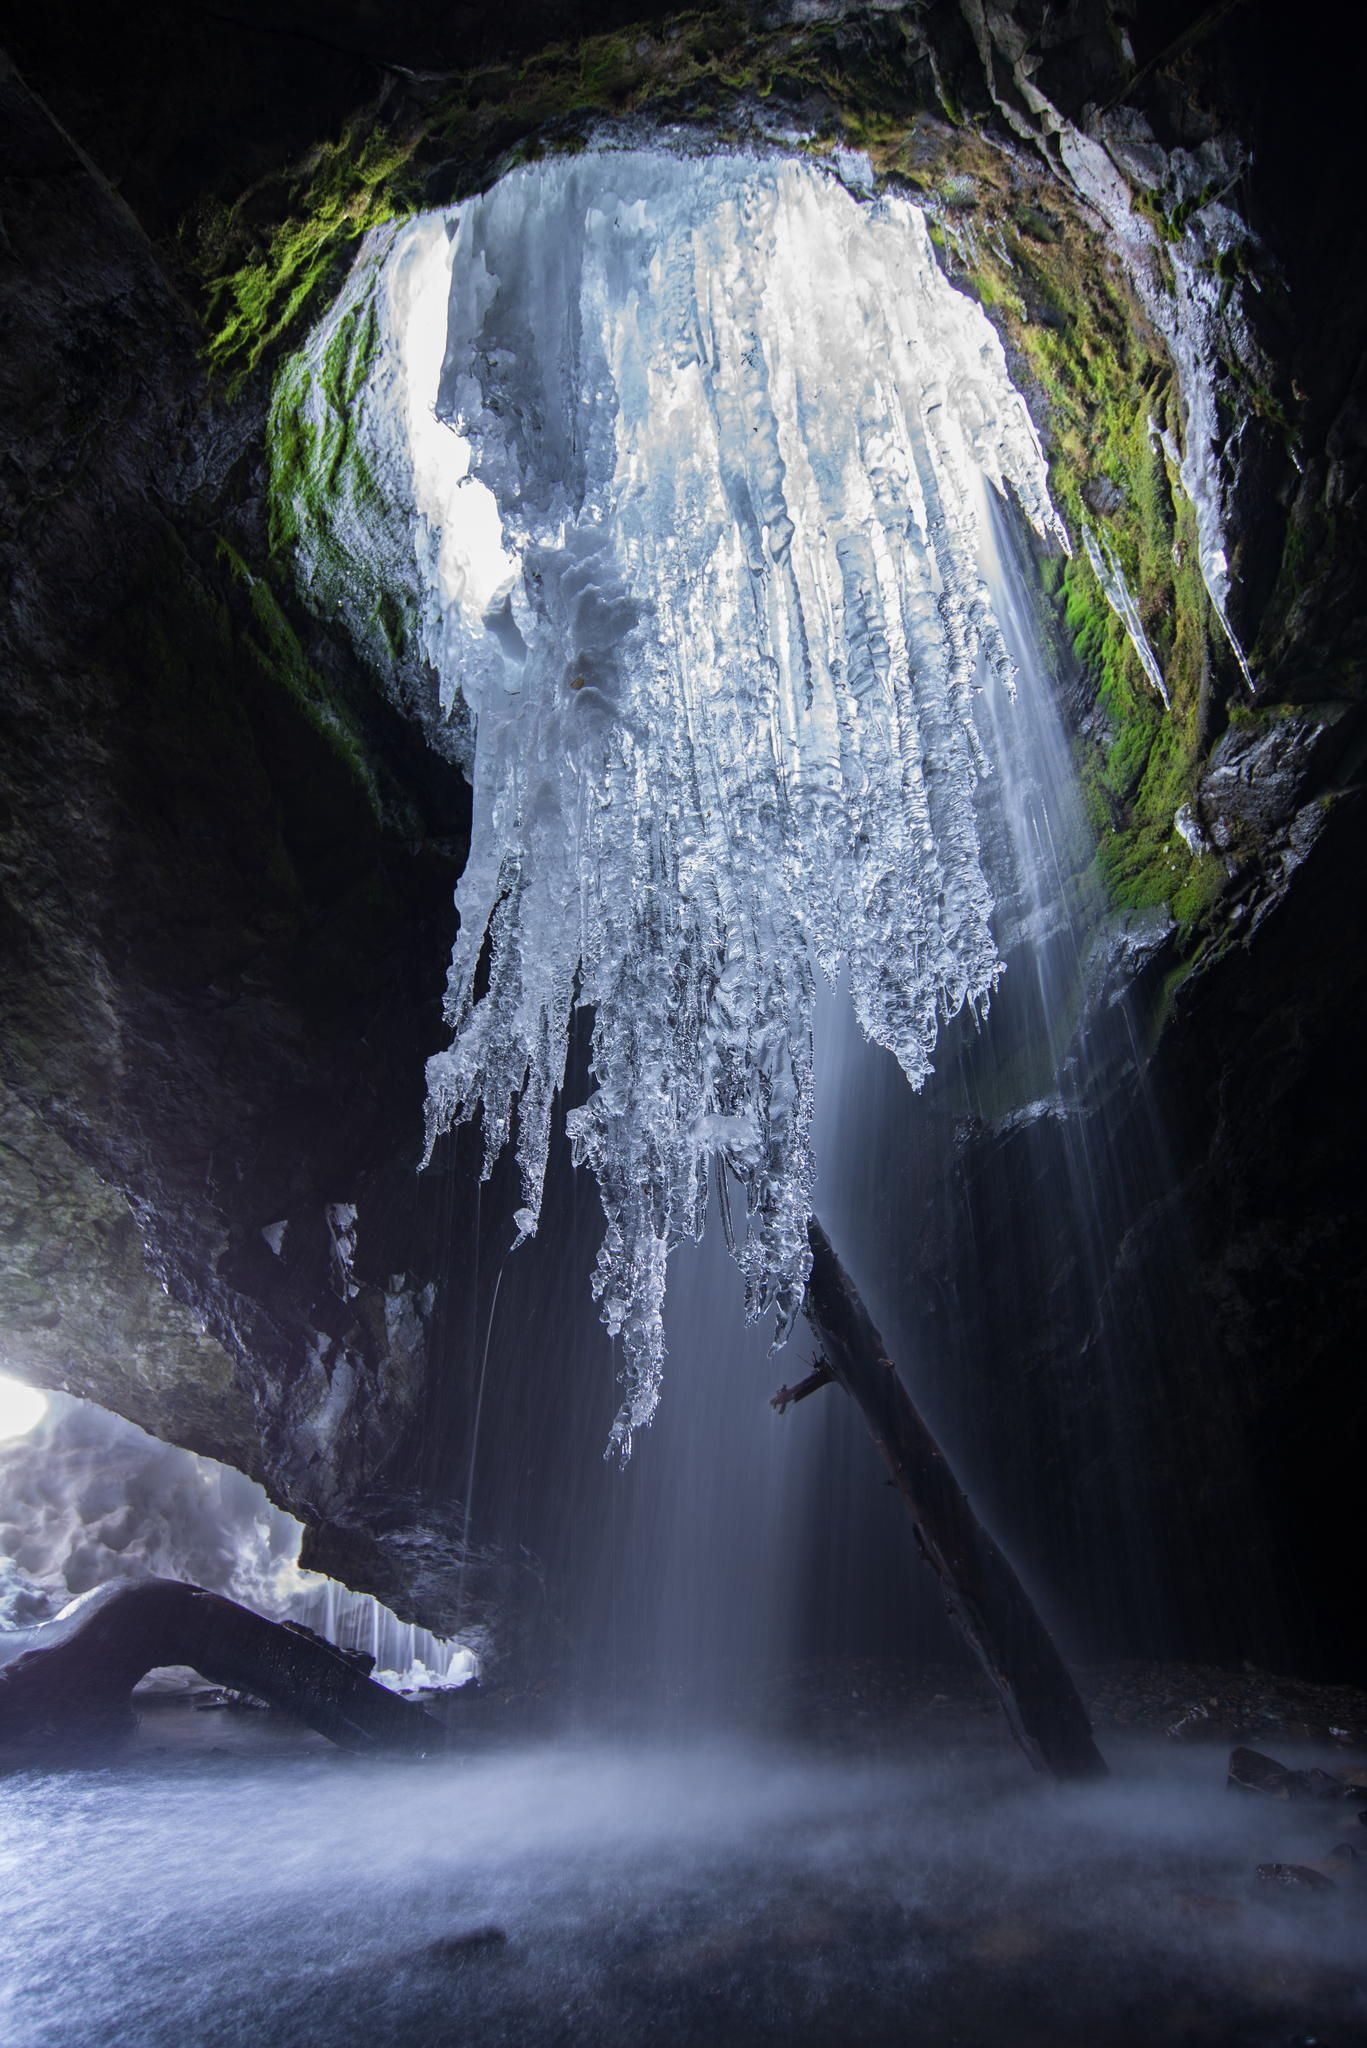 Frozen Light Donut Falls Salt Lake City Utah Usa Www Buziosglobal Com Beautiful Nature Breathtaking Places Pictures